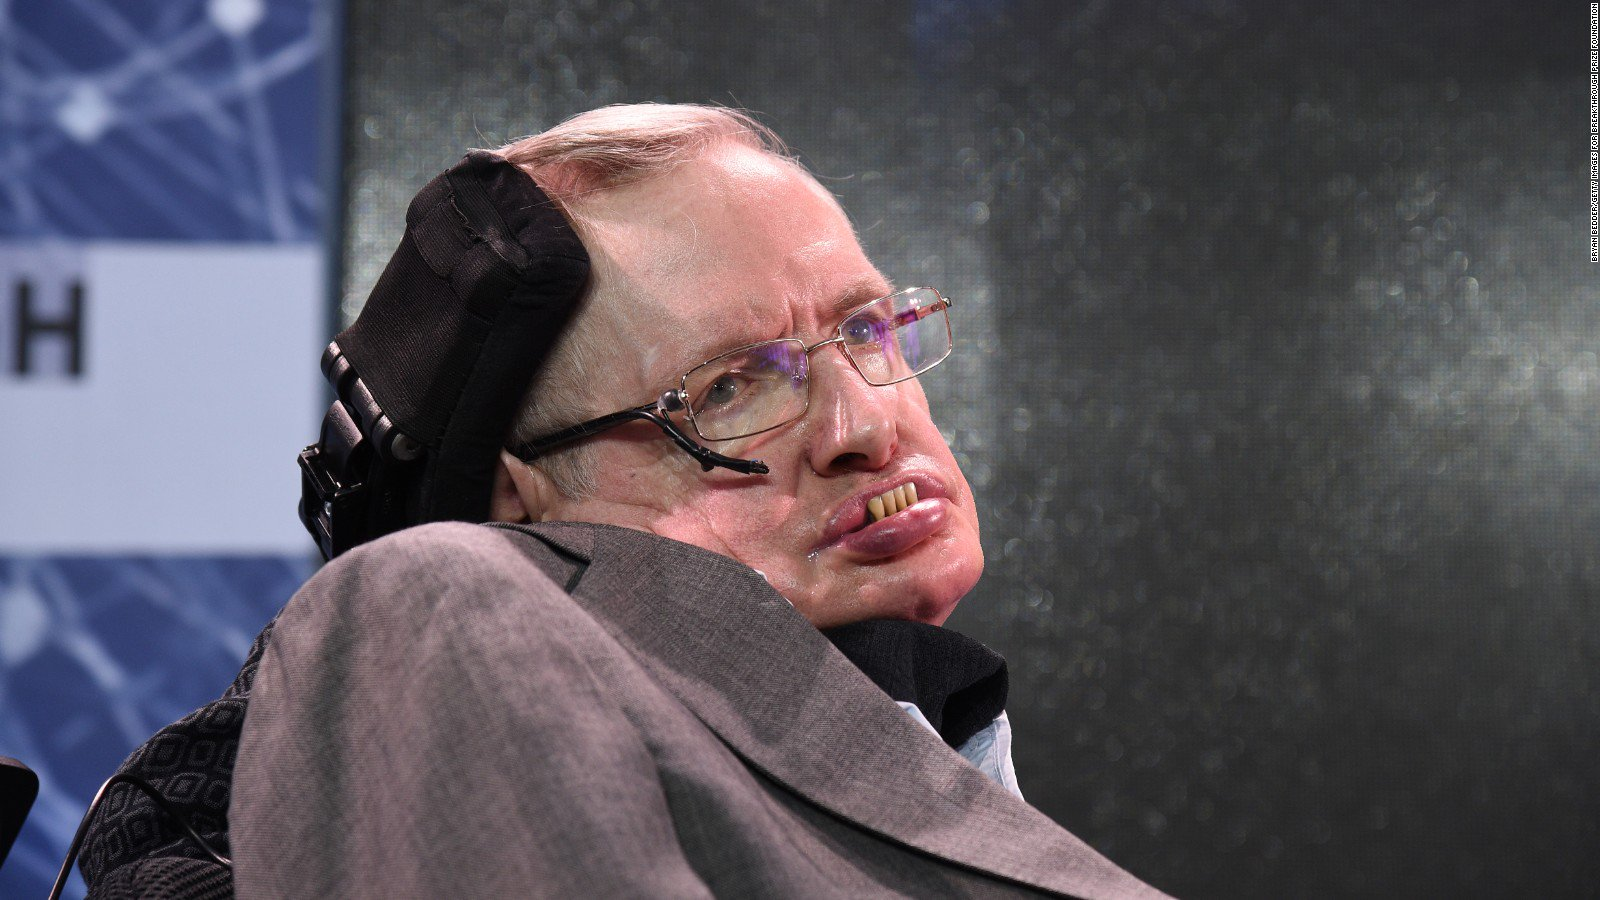 [Archivo] Stephen Hawking tuvo razón todo este tiempo sobre los agujeros negros https://t.co/eAjtdKk9K8 https://t.co/K08FSjFTEB